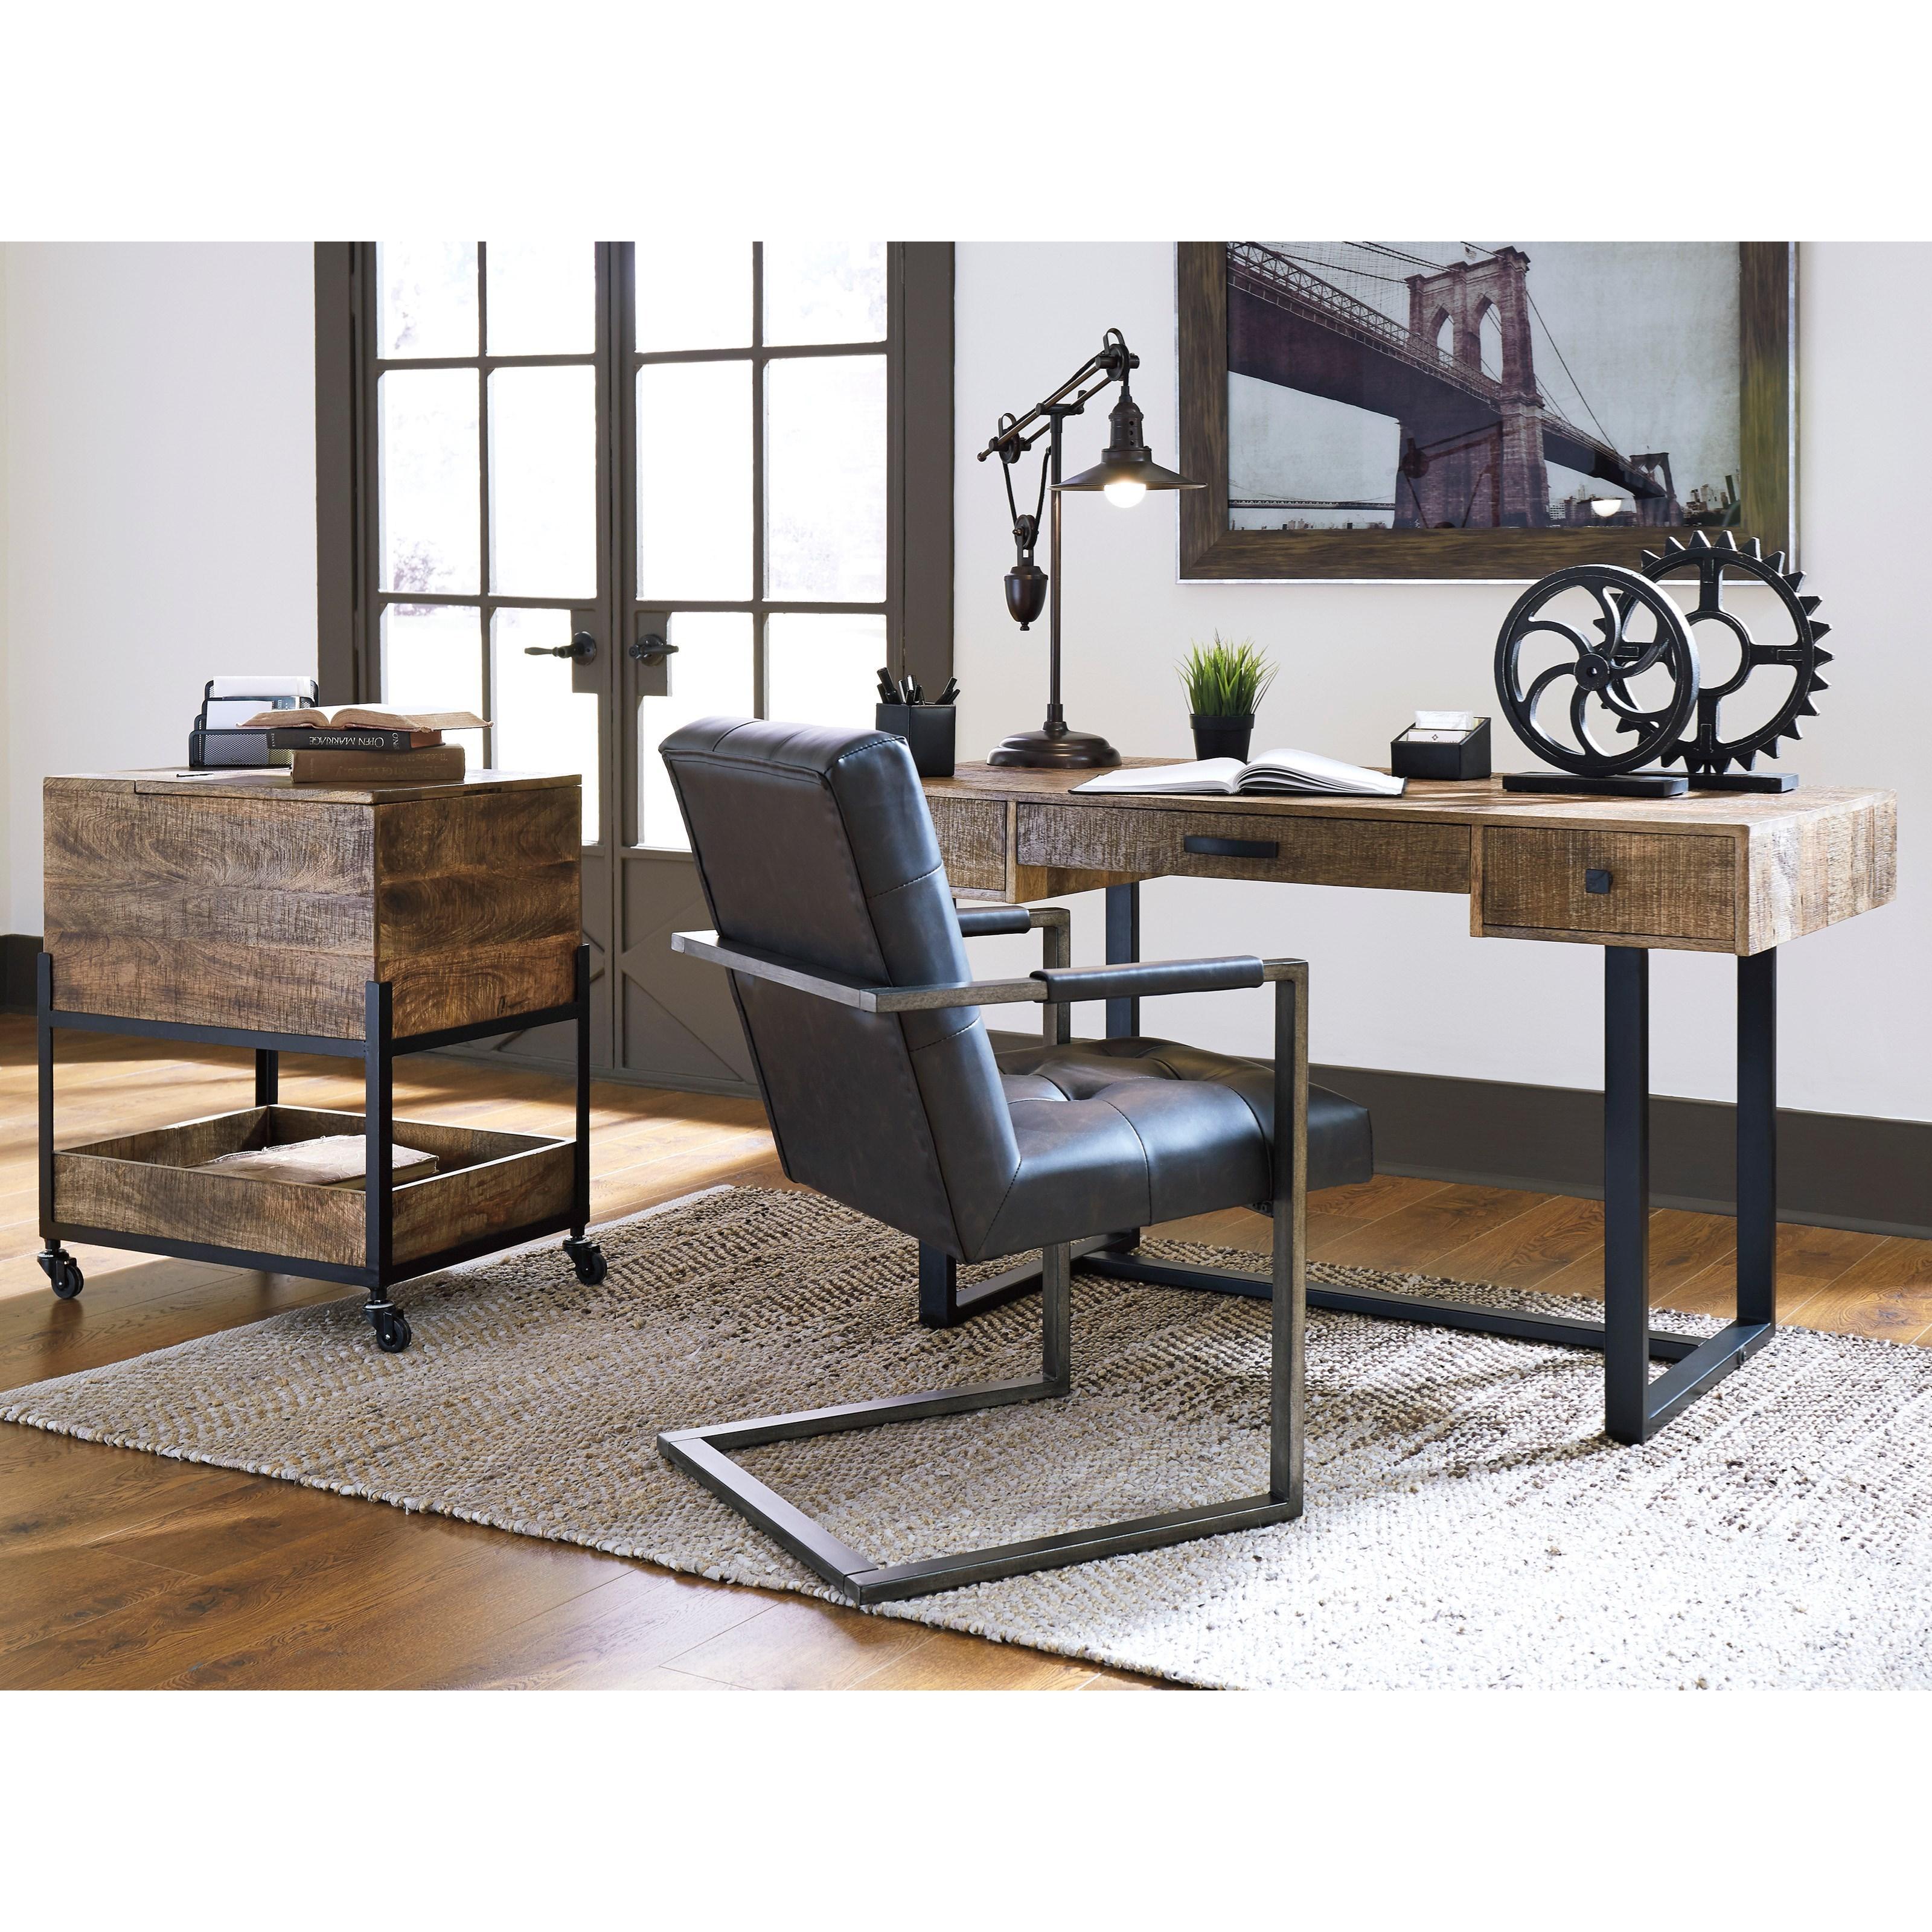 Signature Design By Ashley Viganni H640 26 Mango Wood Metal Home Office Desk Household